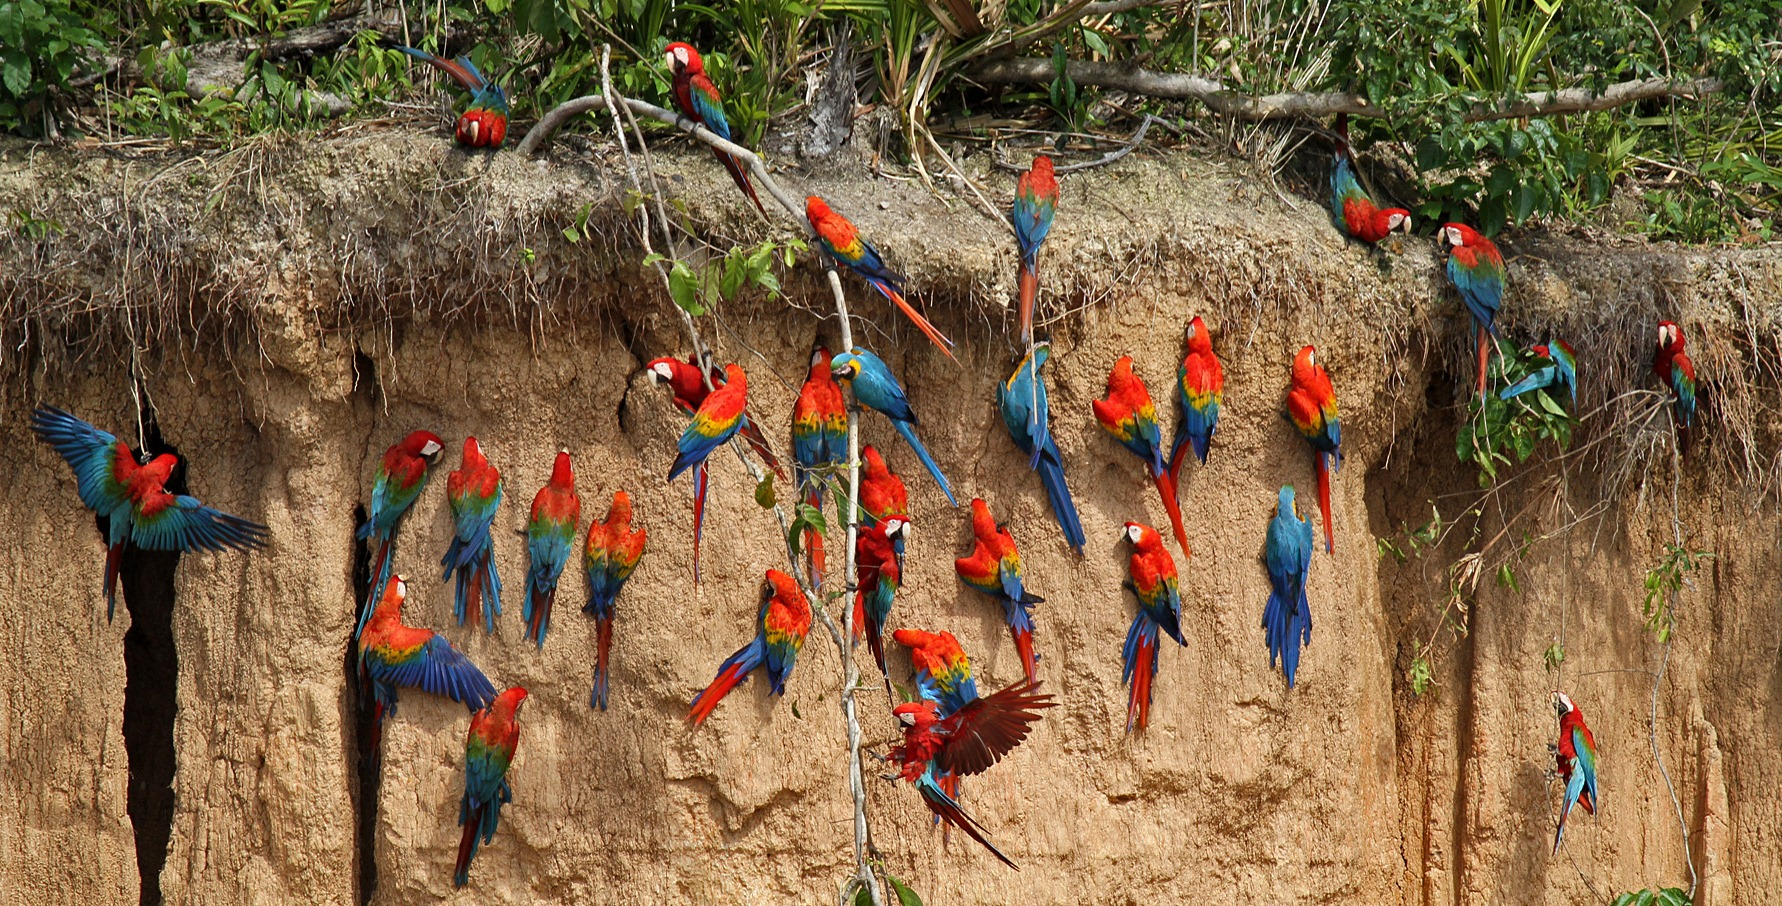 Глиняный берег попугаев Ара в джунглях Амазонии